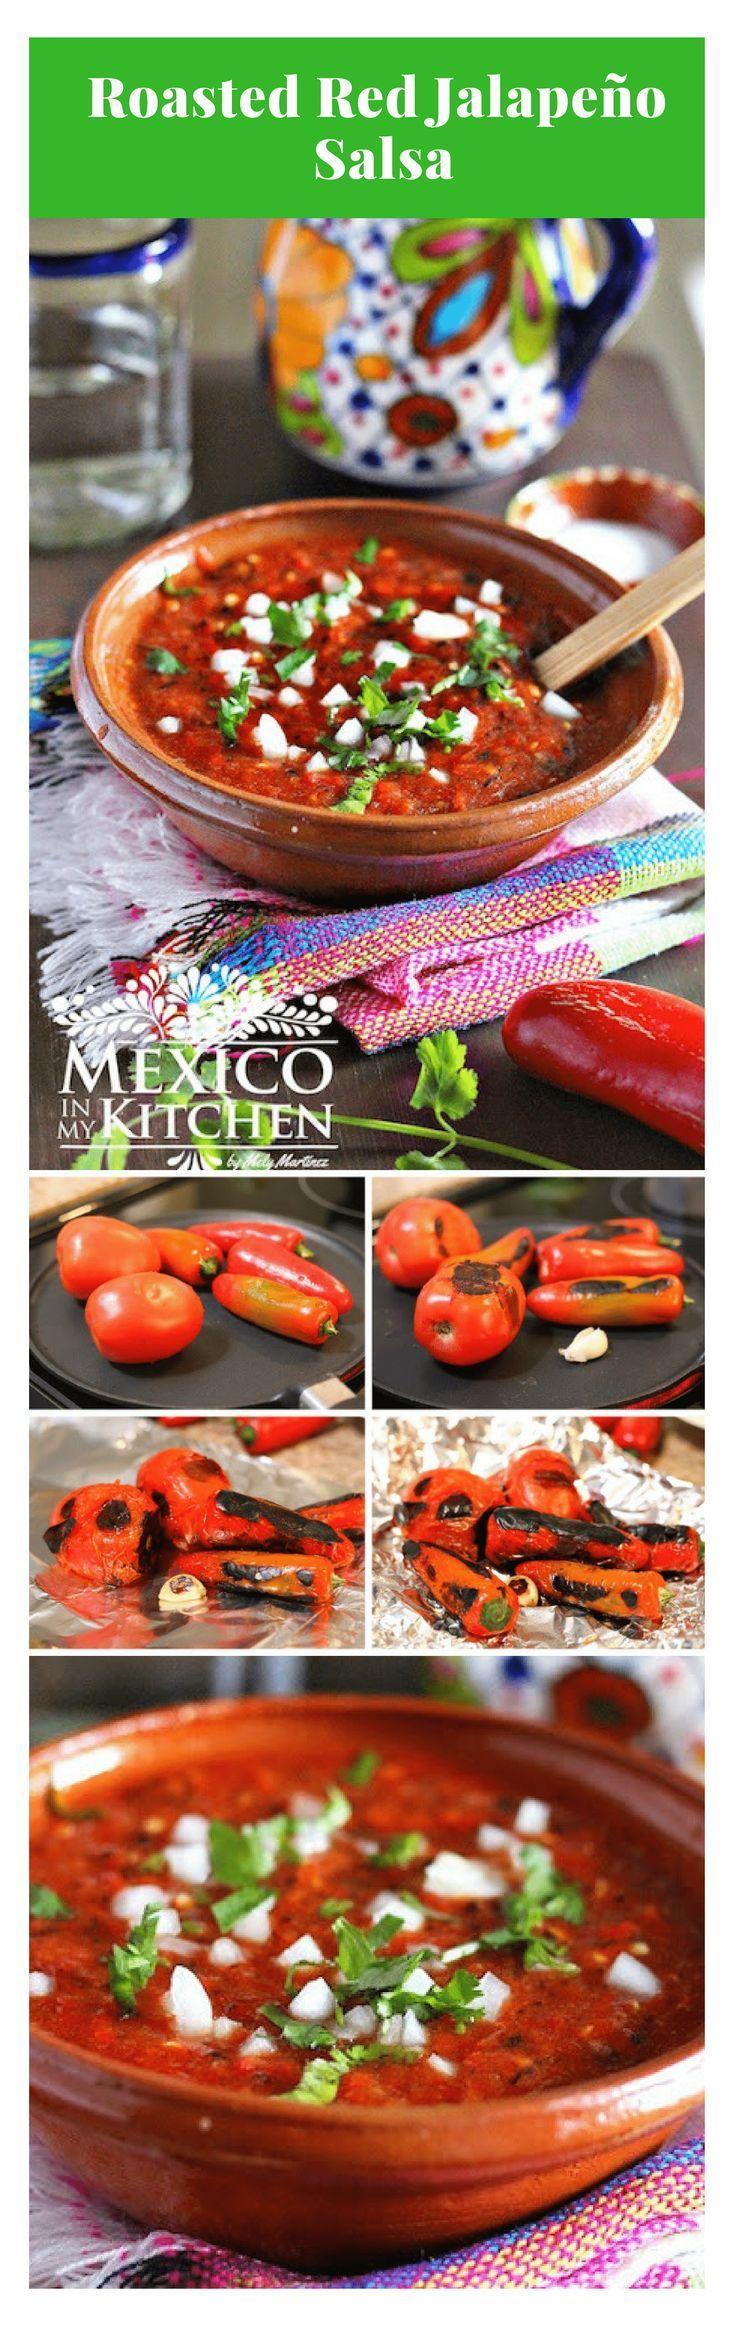 Roasted red jalapeño salsa Recipe Mexican breakfast